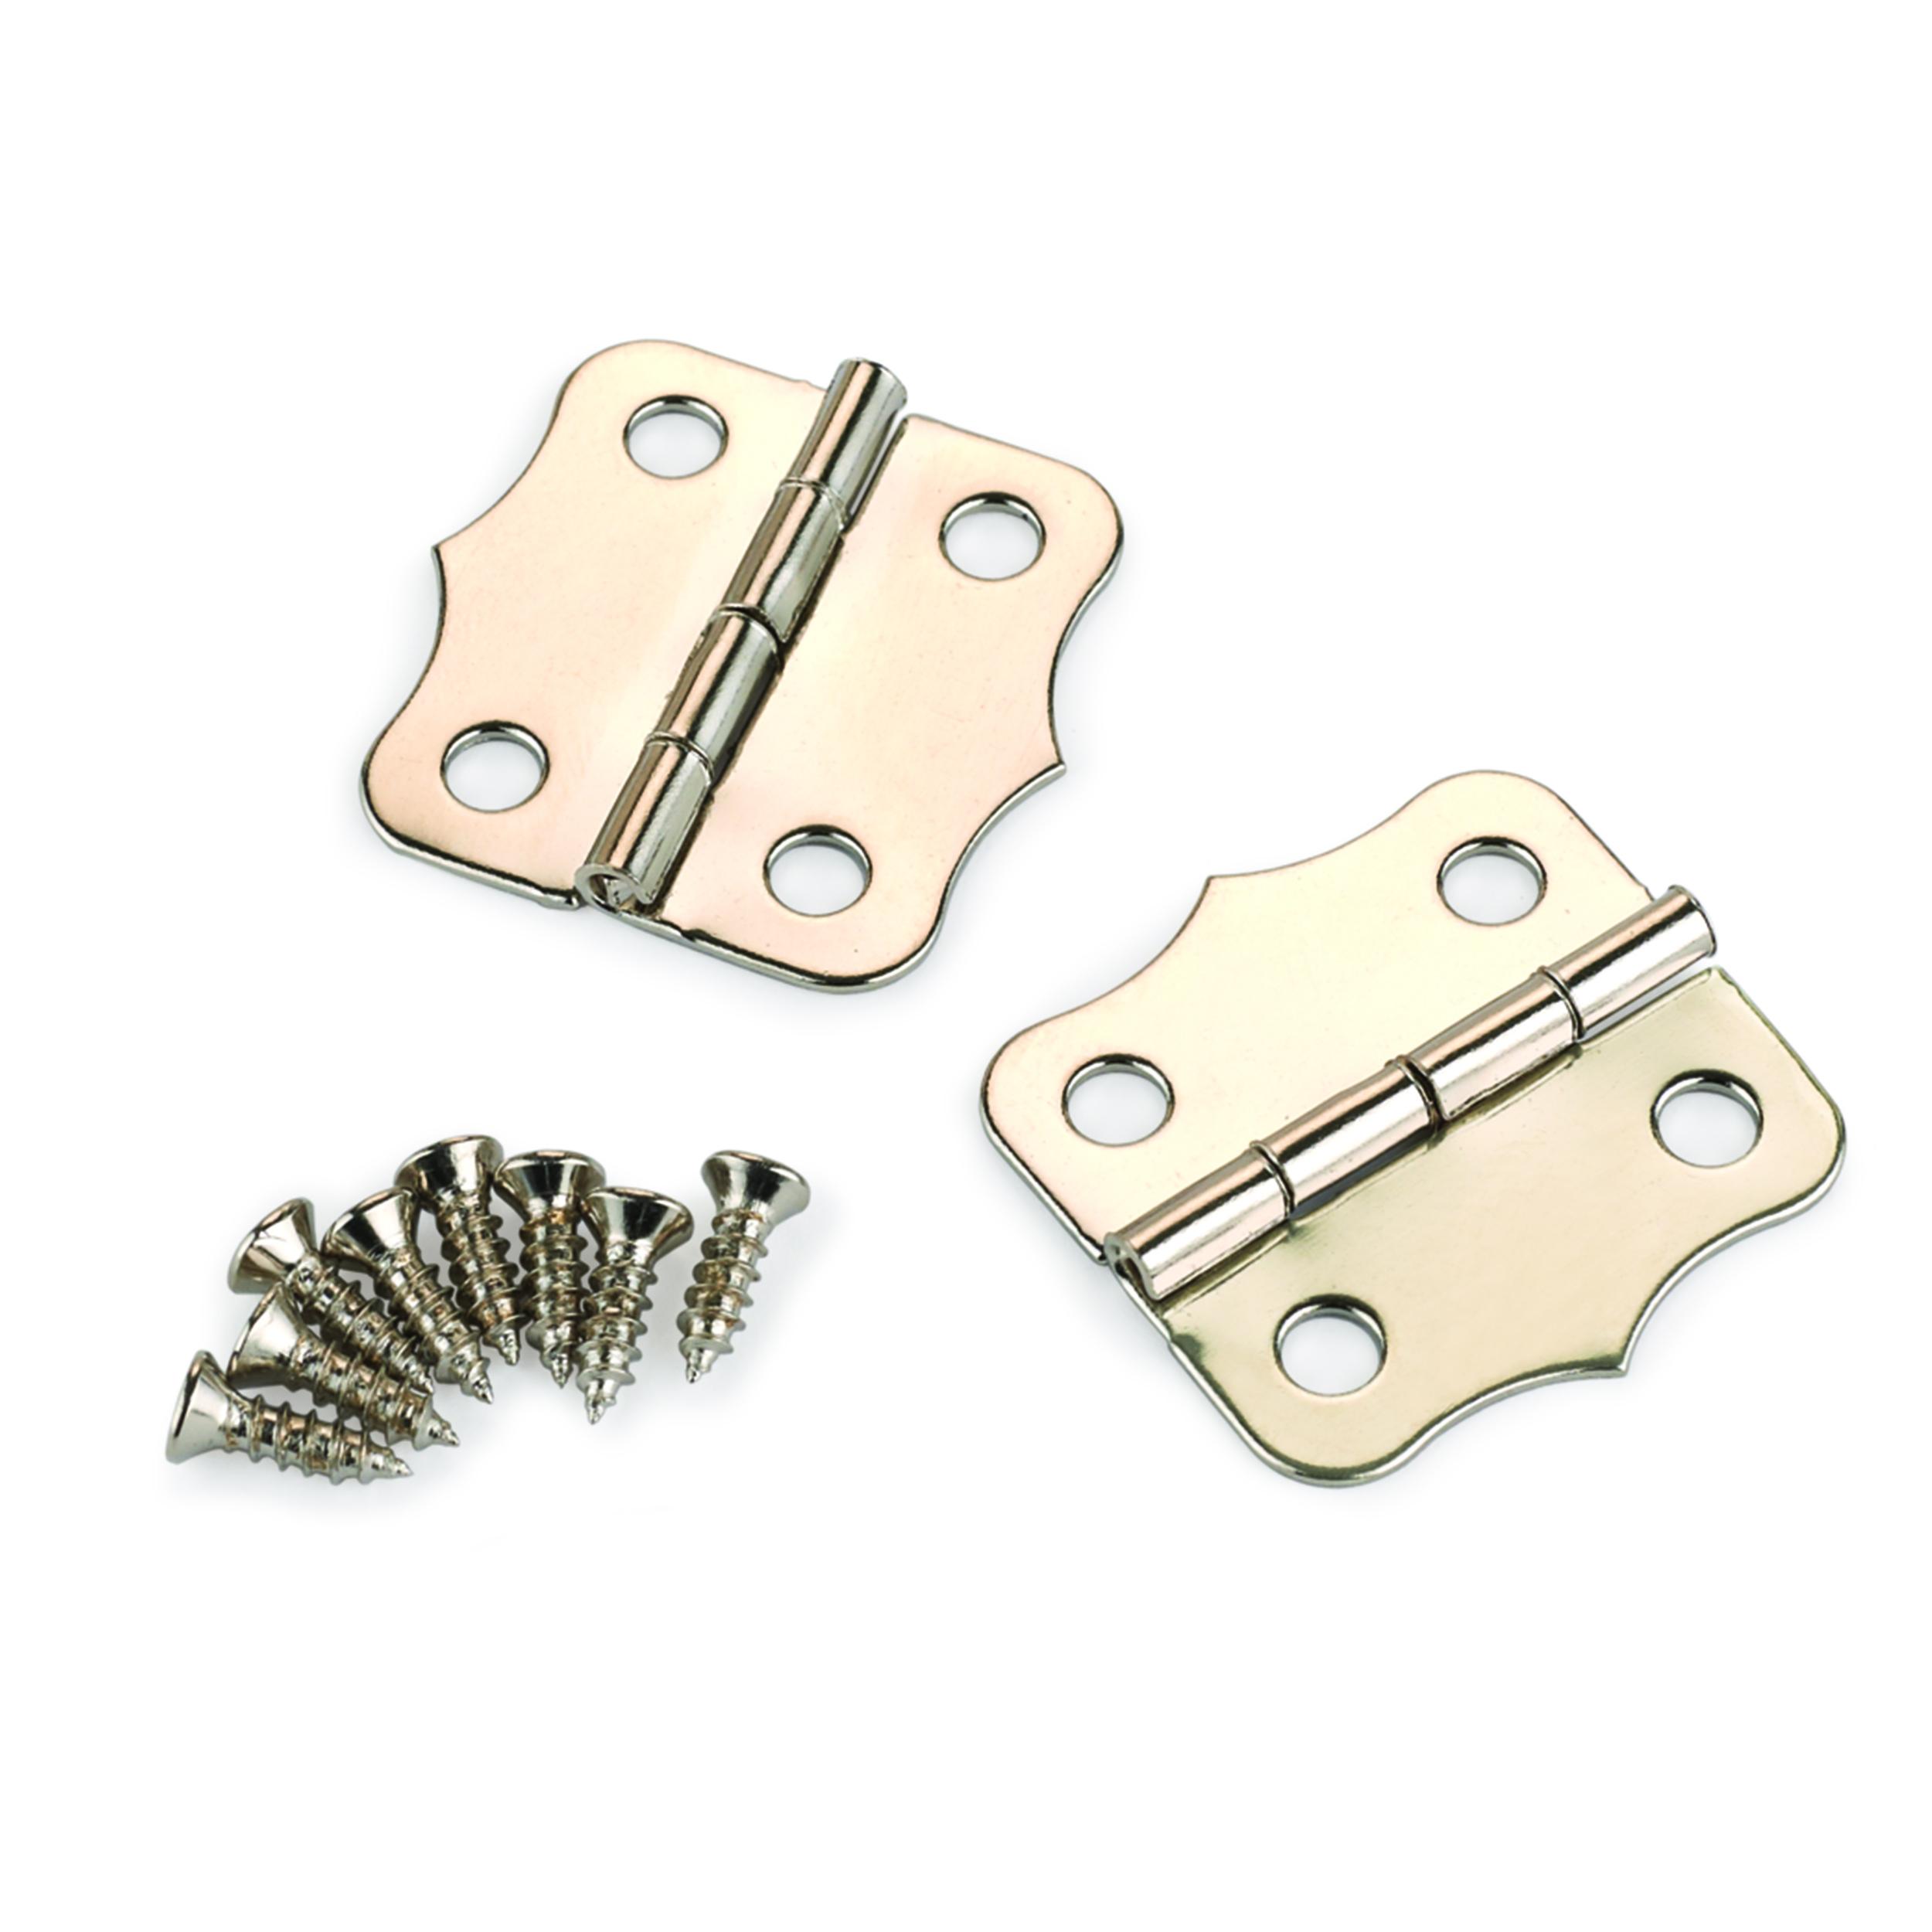 Small Box Nickel Plated Hinge 24mm x 24mm pair